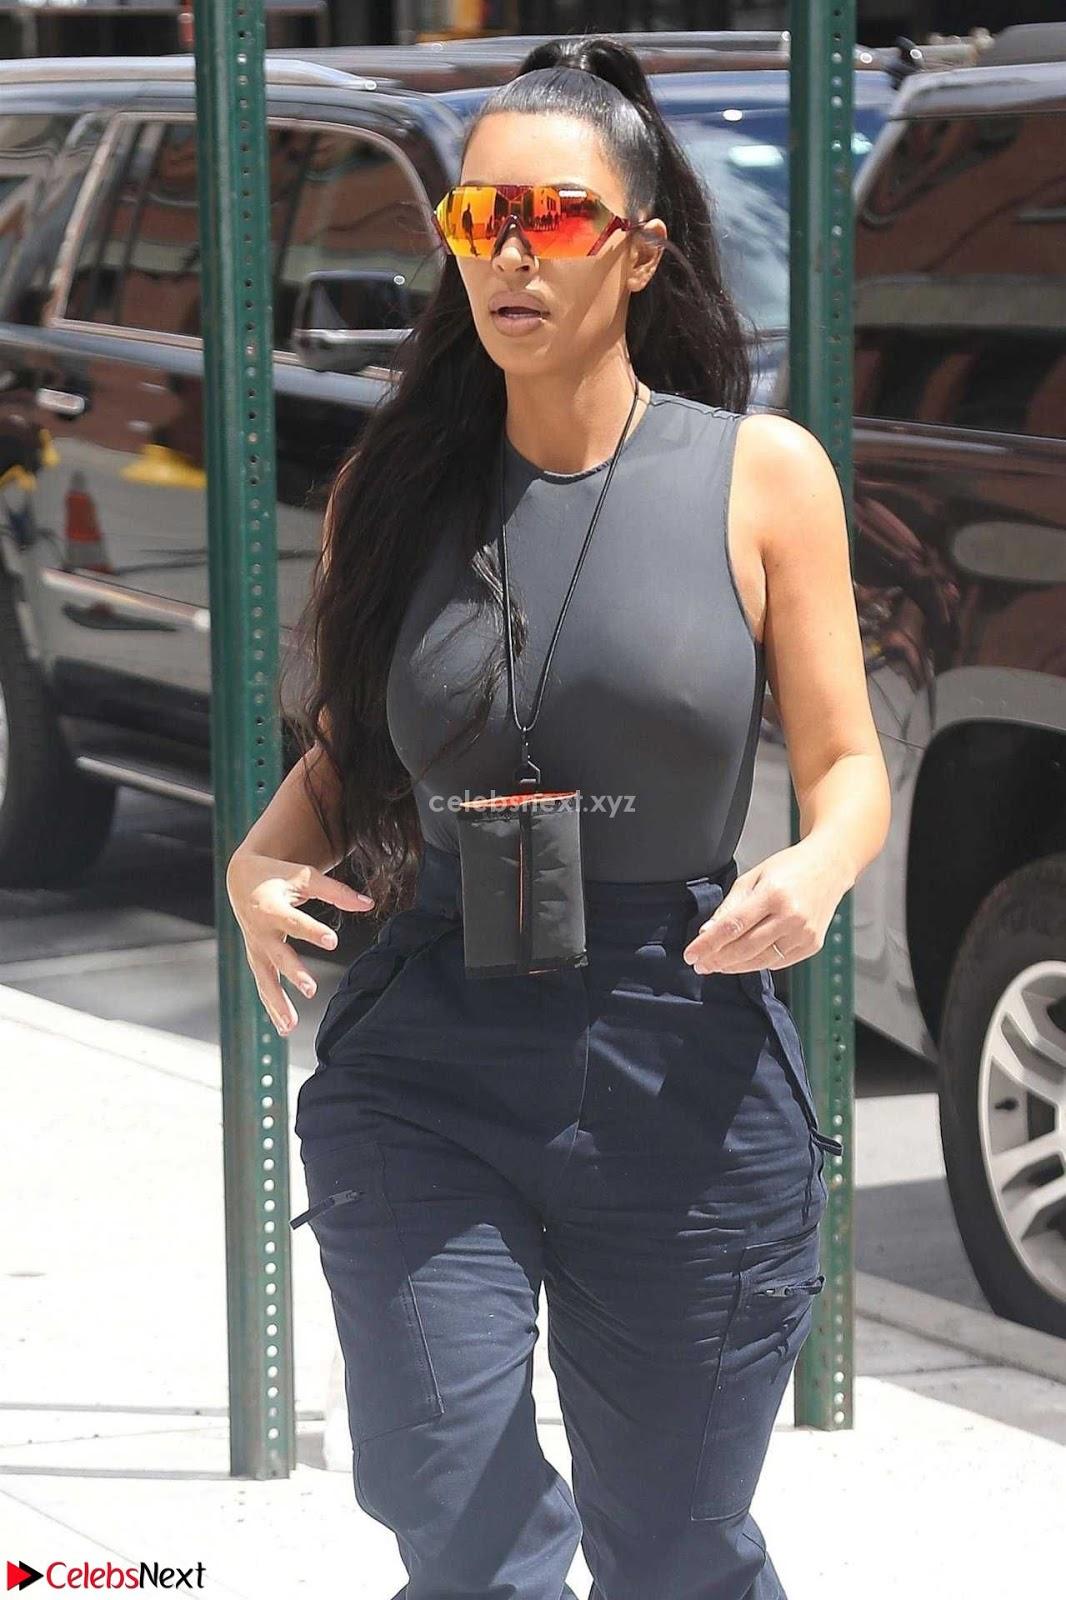 Kim Kardashian hard nipples visible form Tight T-Shirt Nipple Pokies Tits huge ~ CelebsNext.xyz Exclusive Celebrity Pics